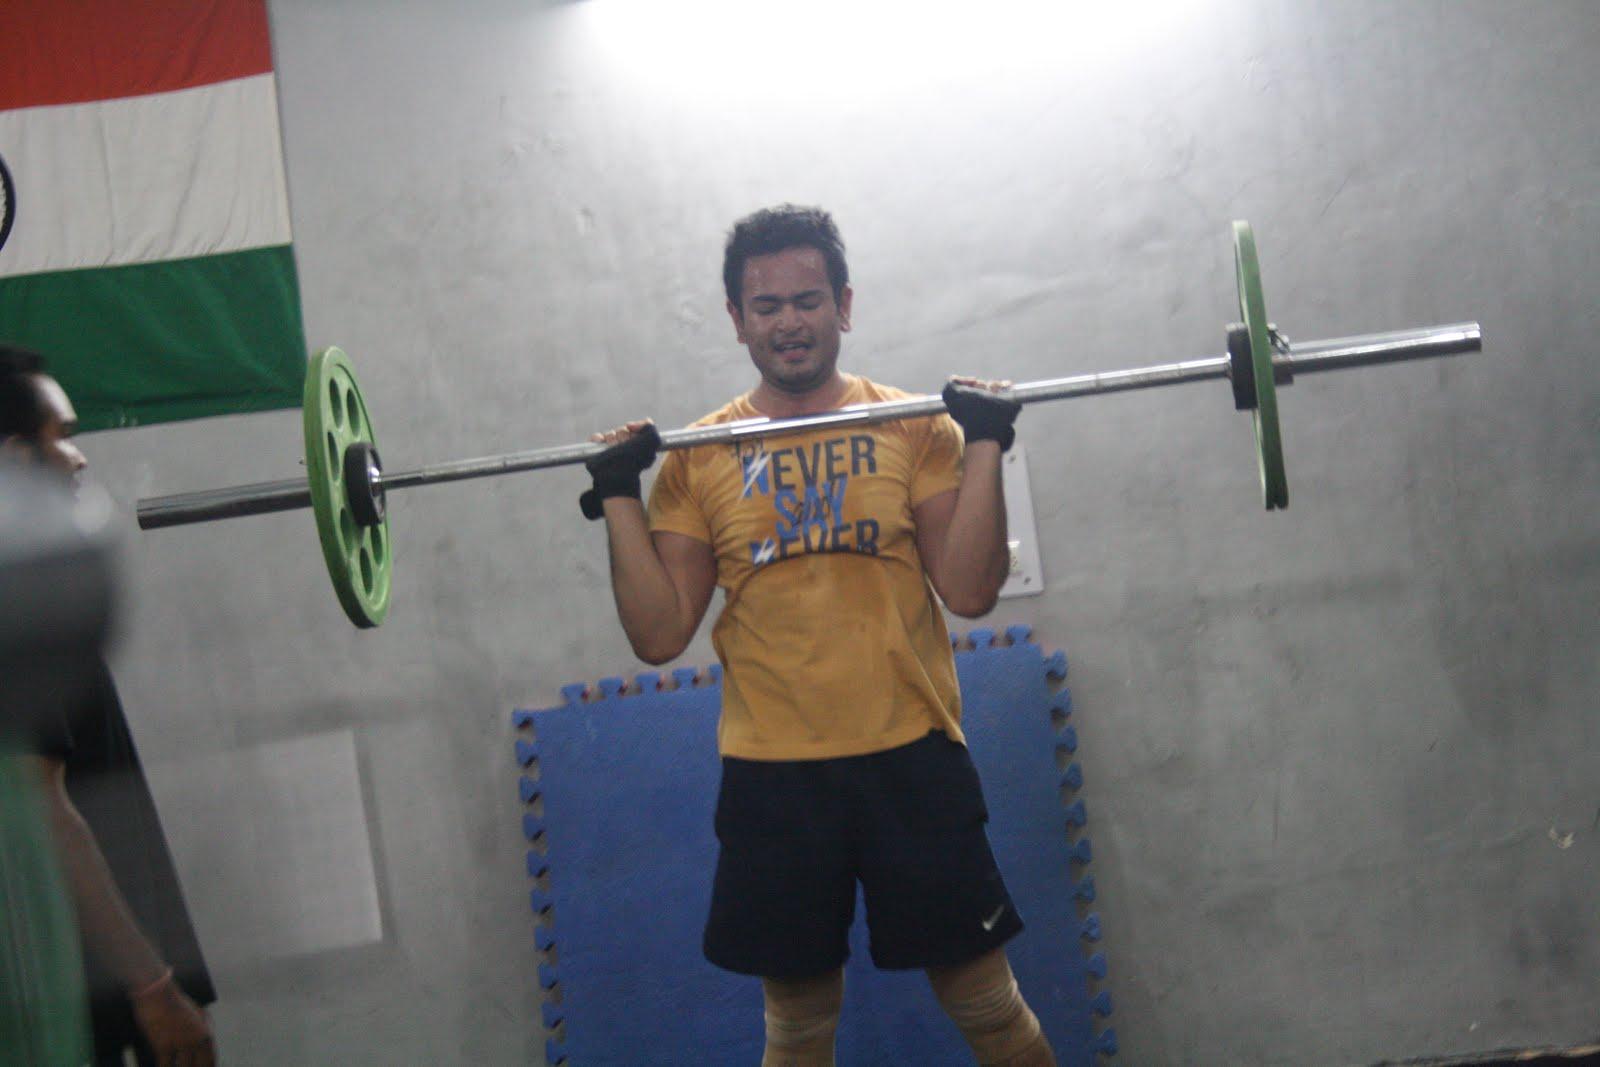 Sumit Tanwar